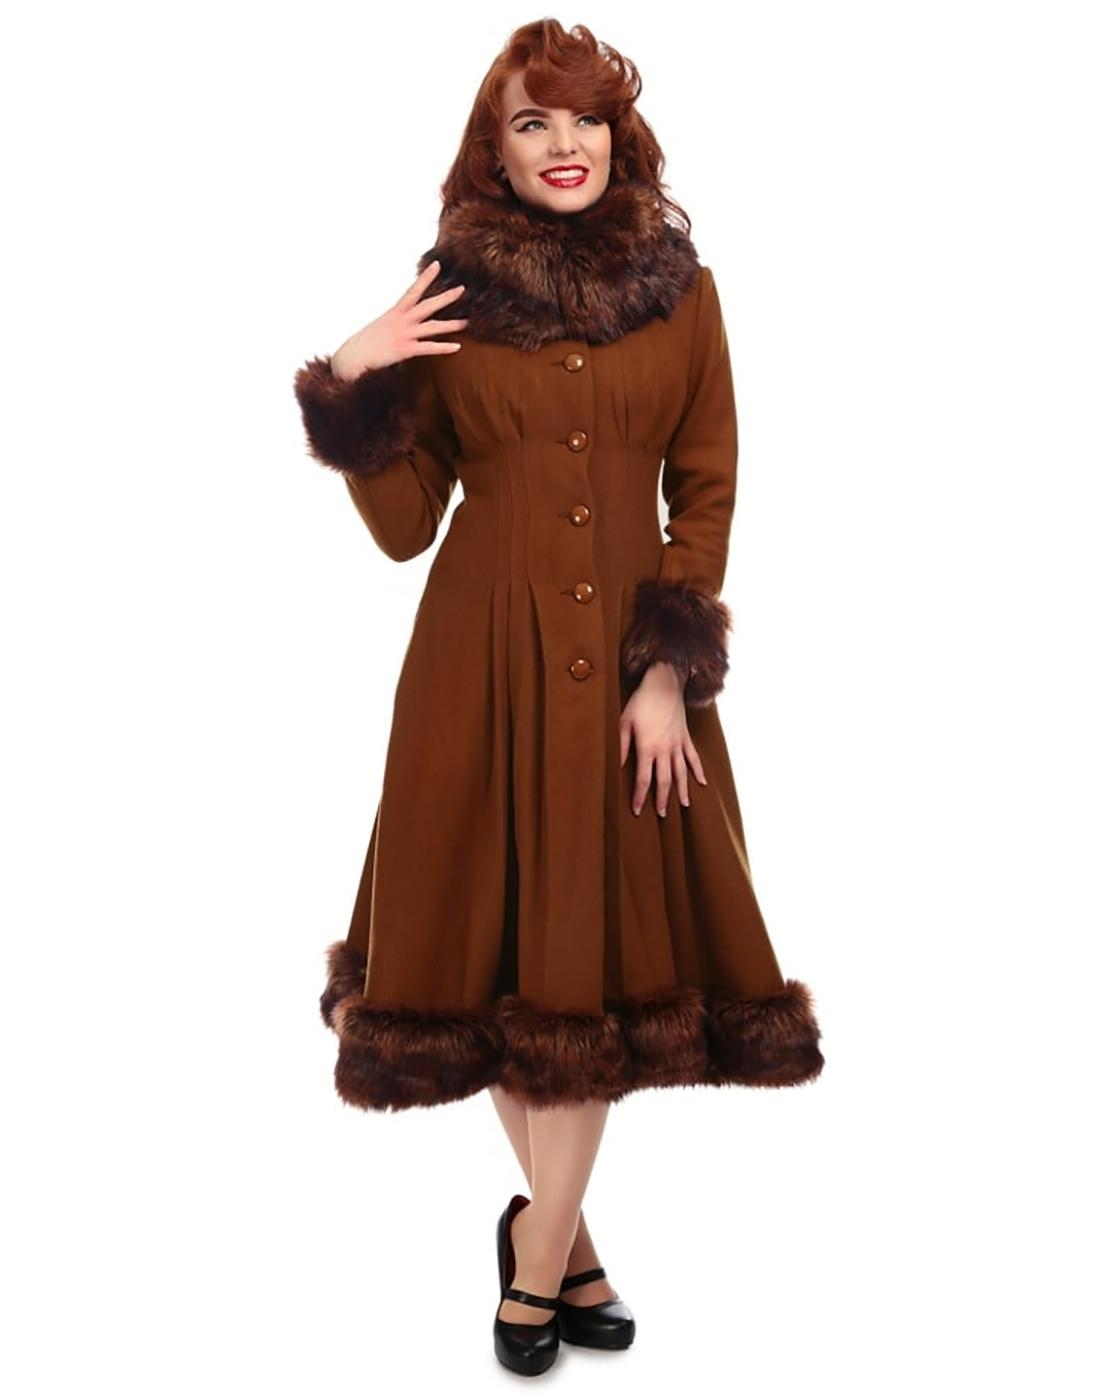 Pearl COLLECTIF Vintage 1950s Faux Fur Coat in Tan